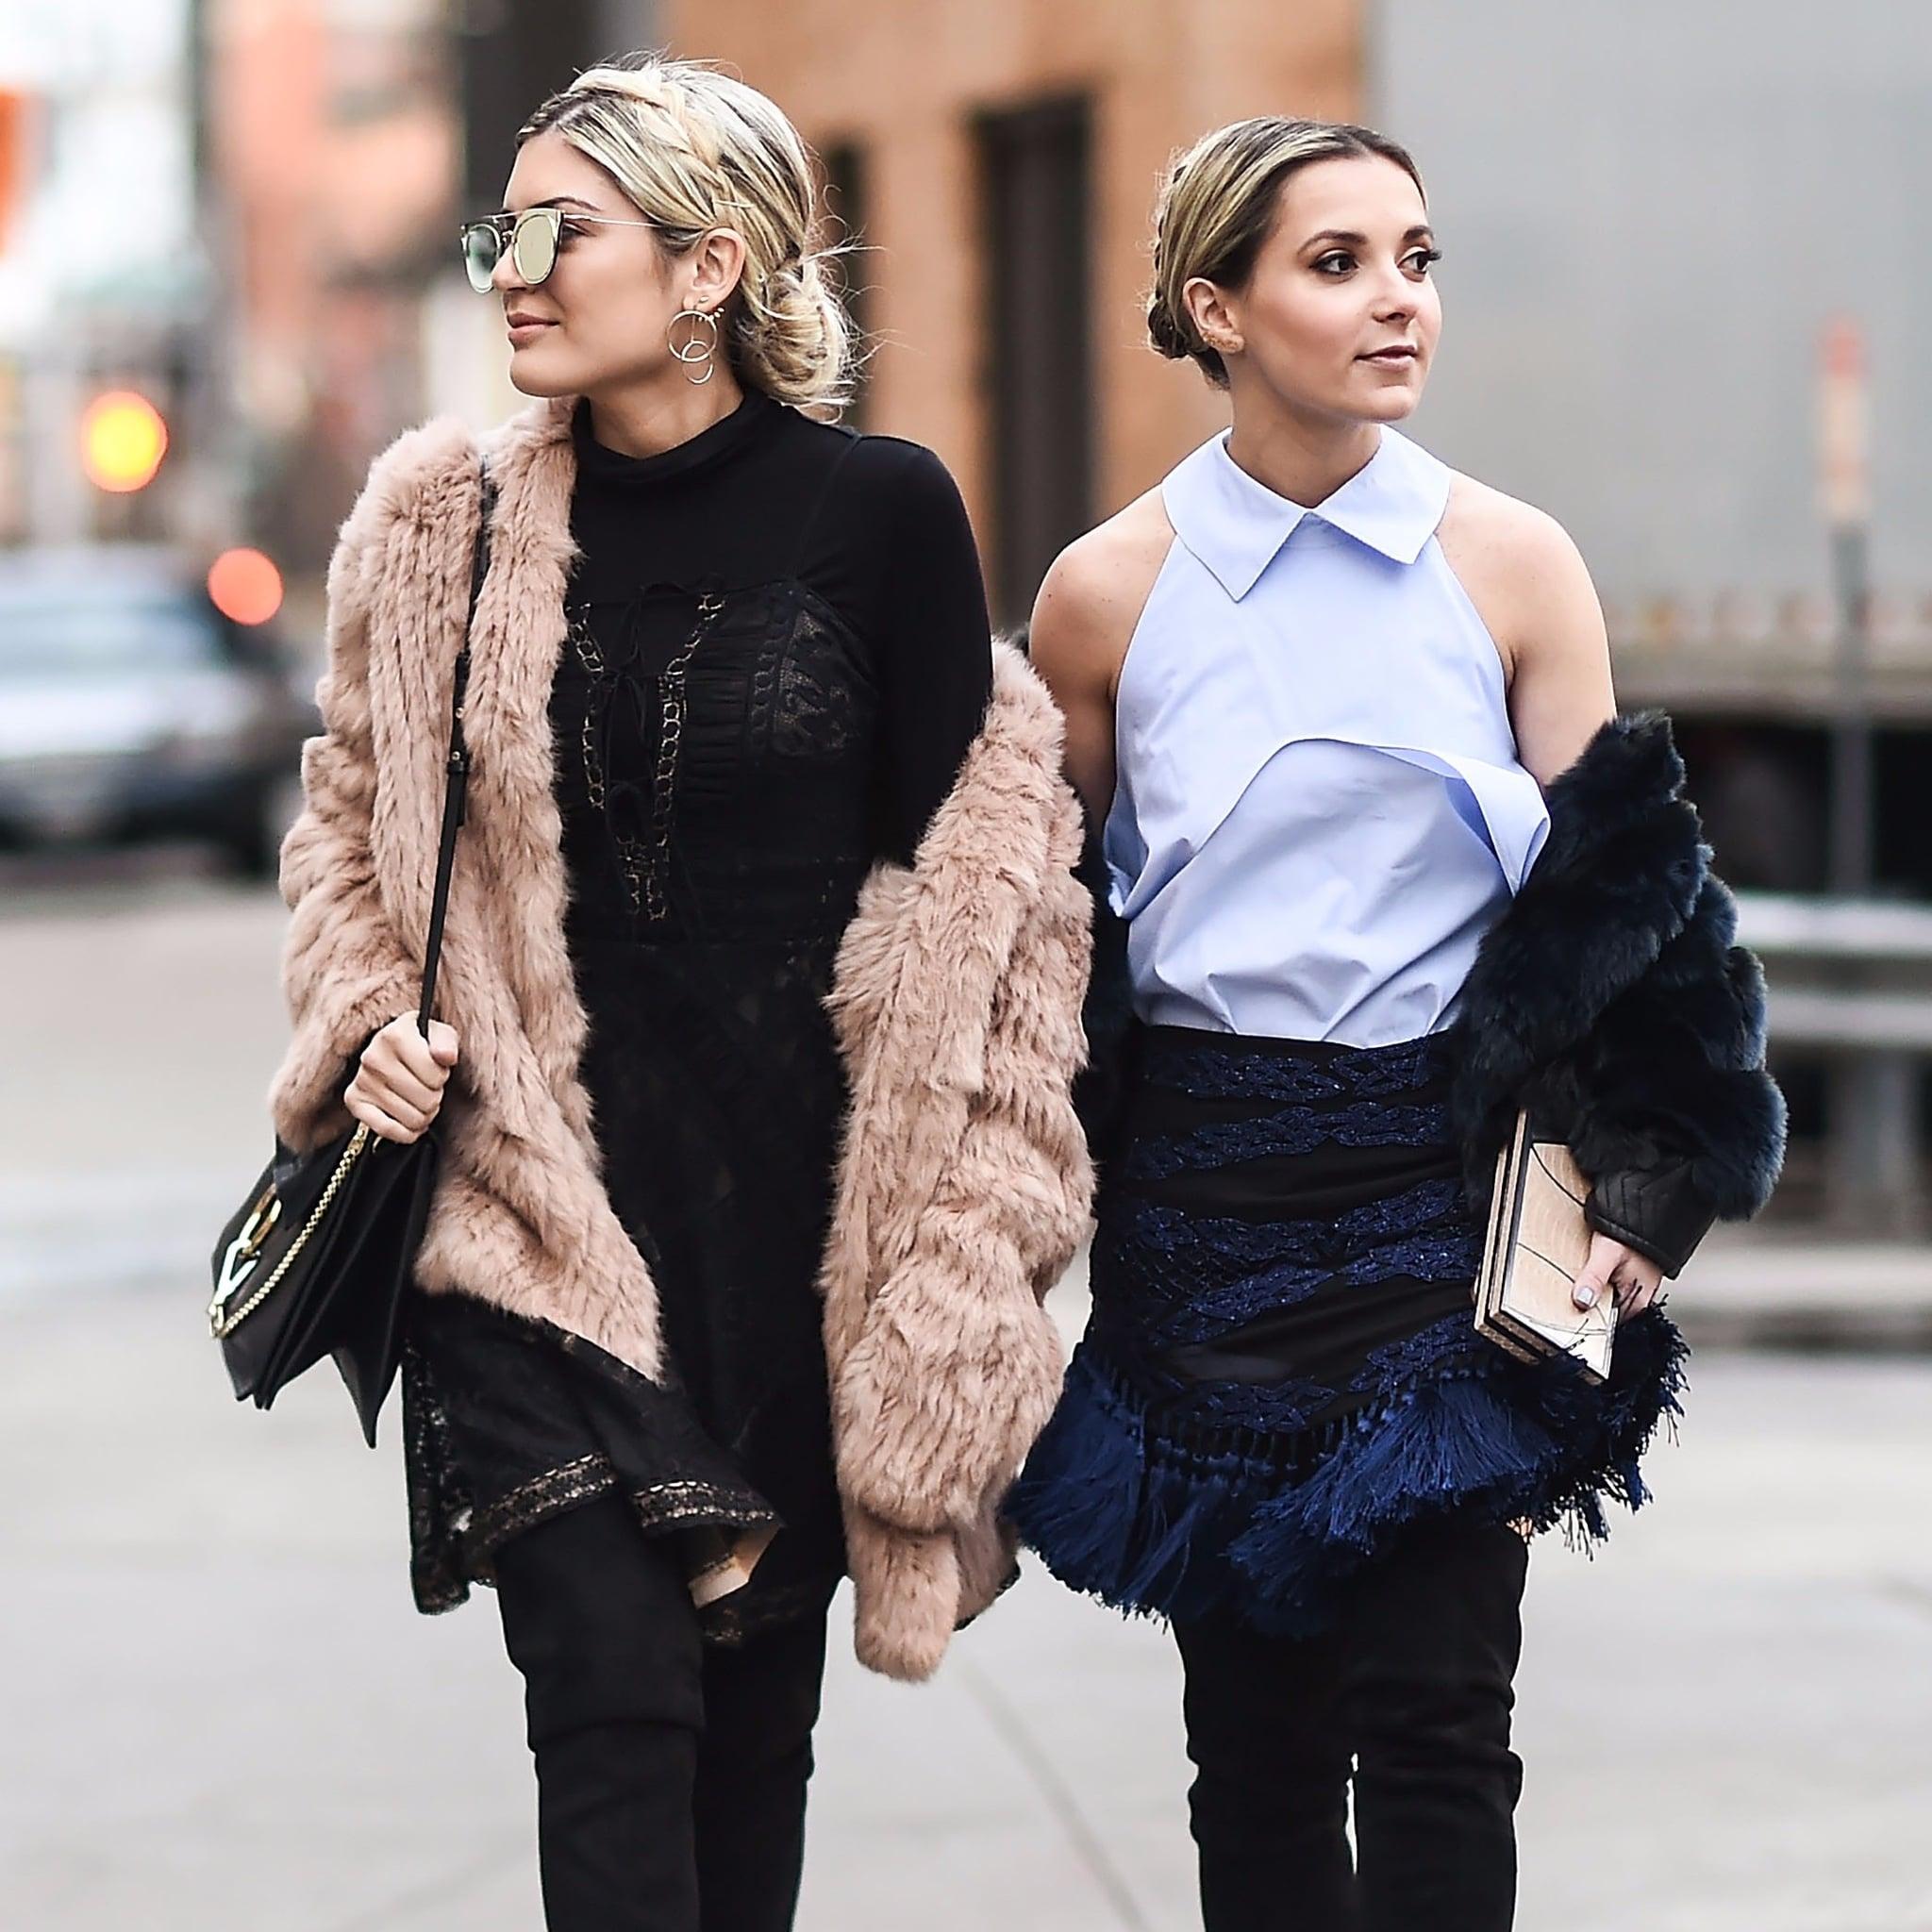 Fashion trends for fall - Fashion Trends For Fall 41